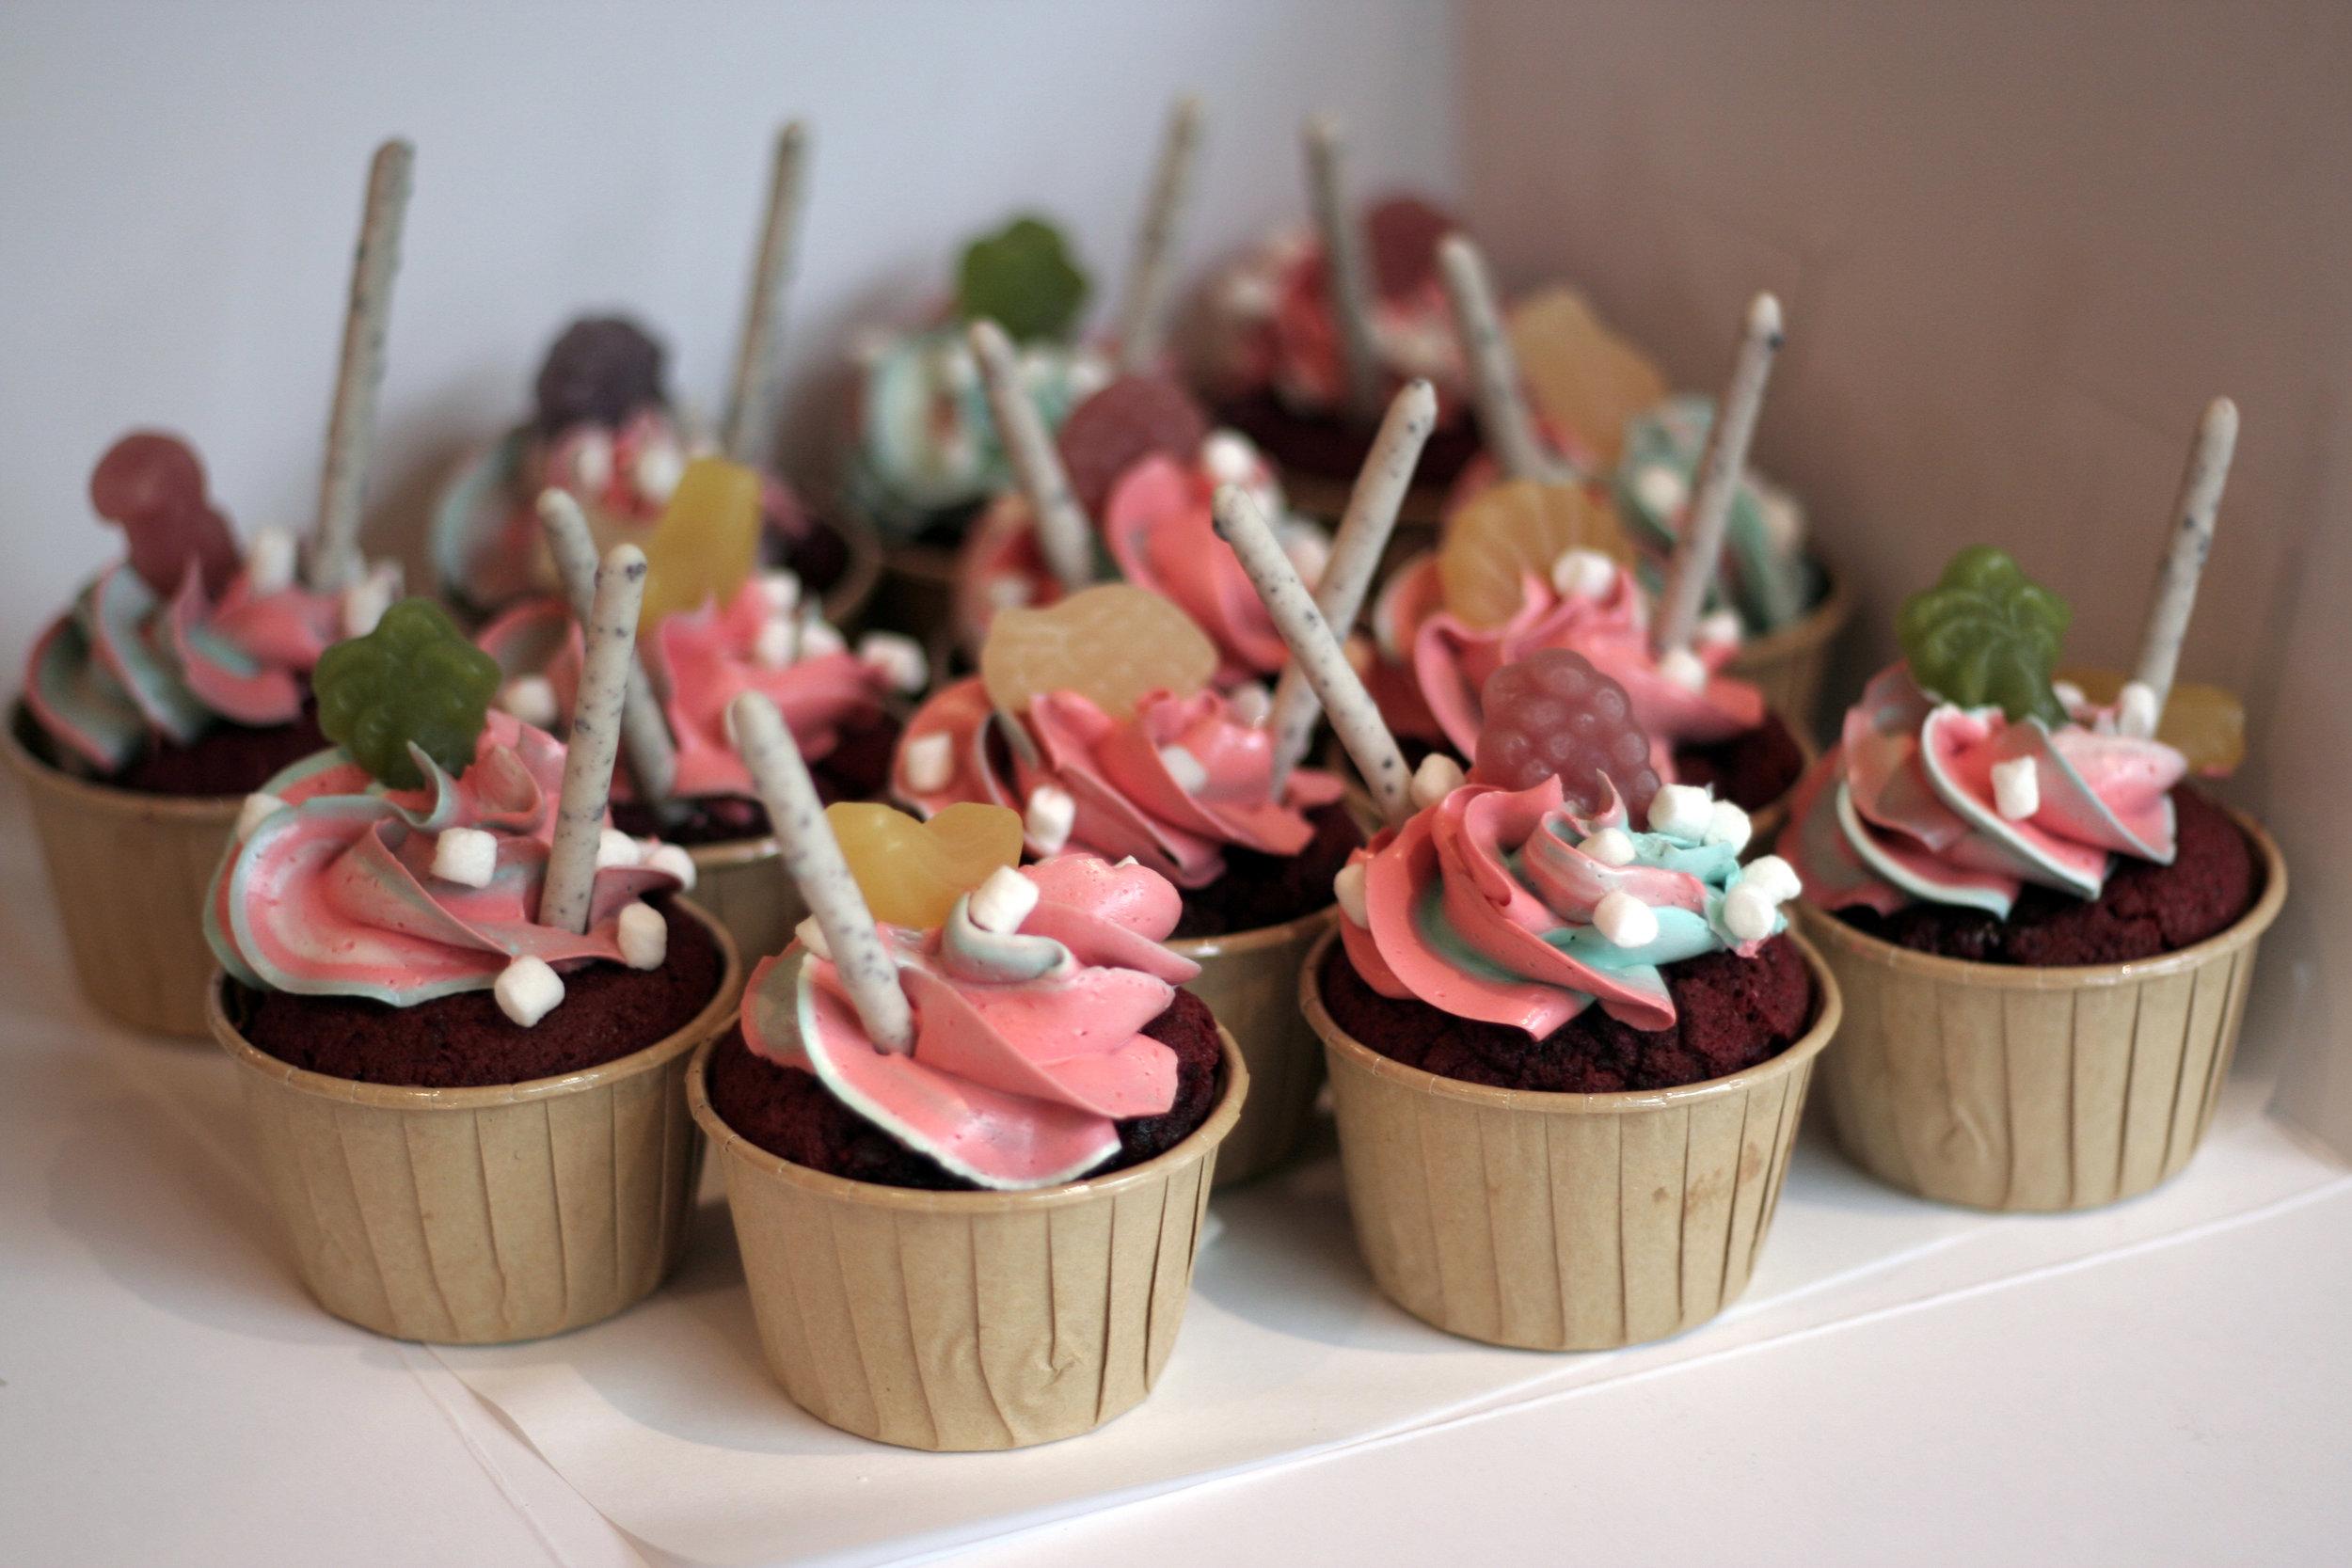 HTSP_CUSTOMISED_cupcakes01a.JPG